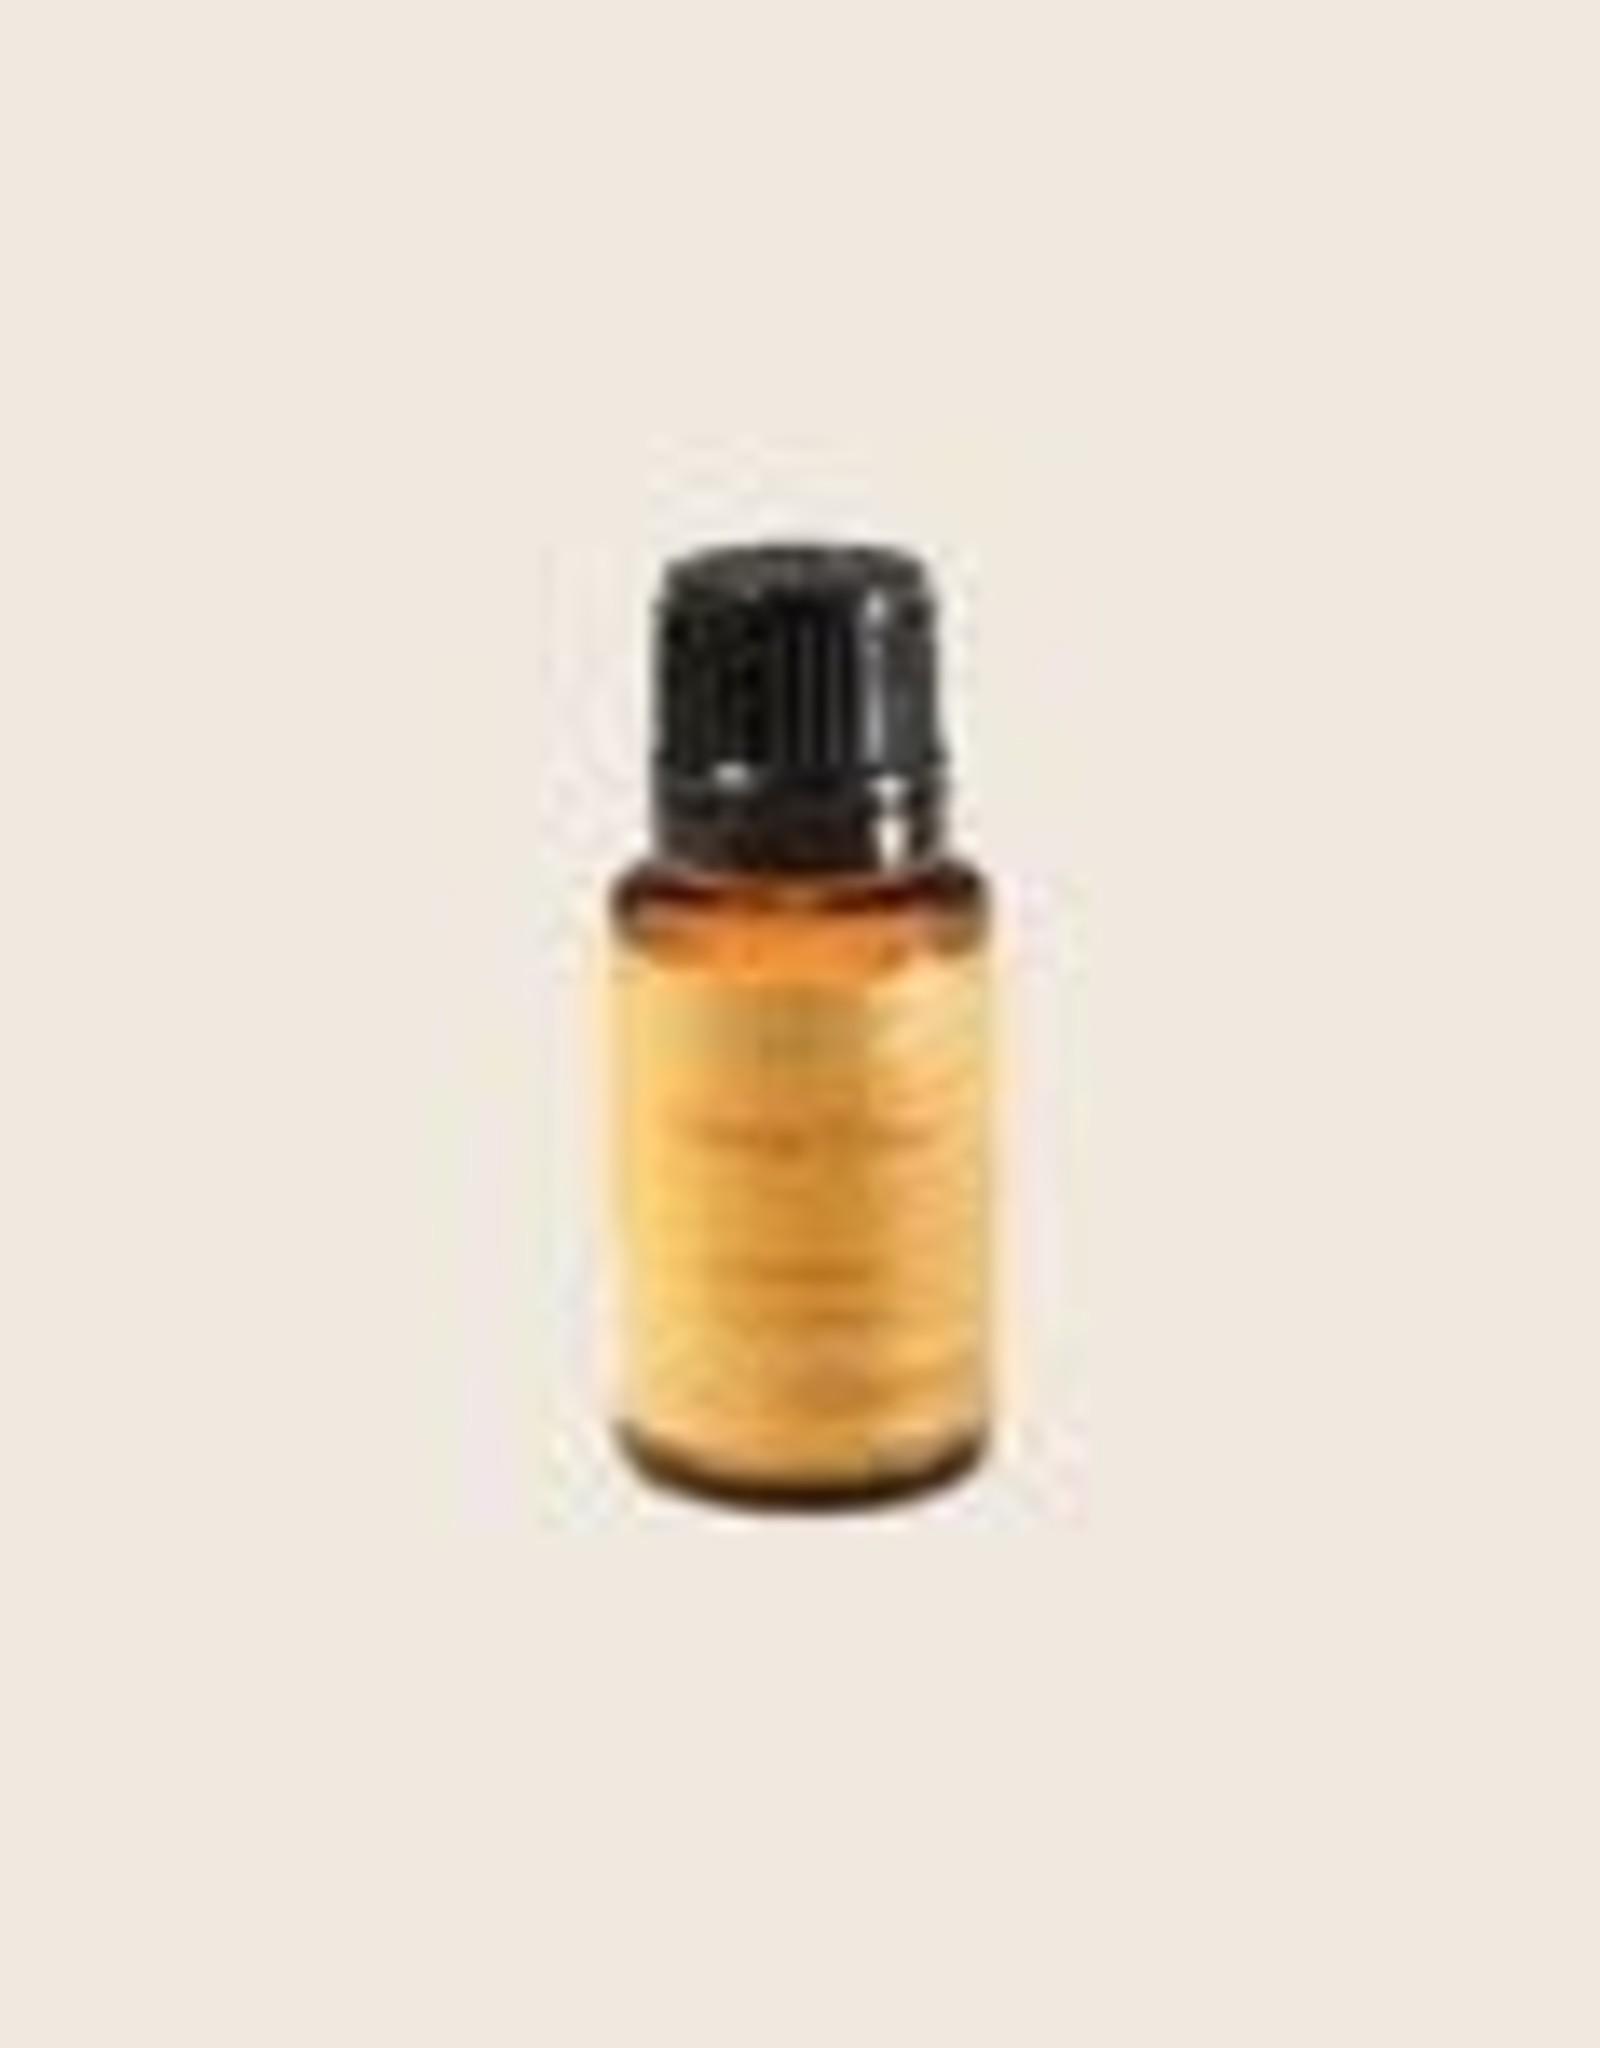 Aromatique Refresher Oil